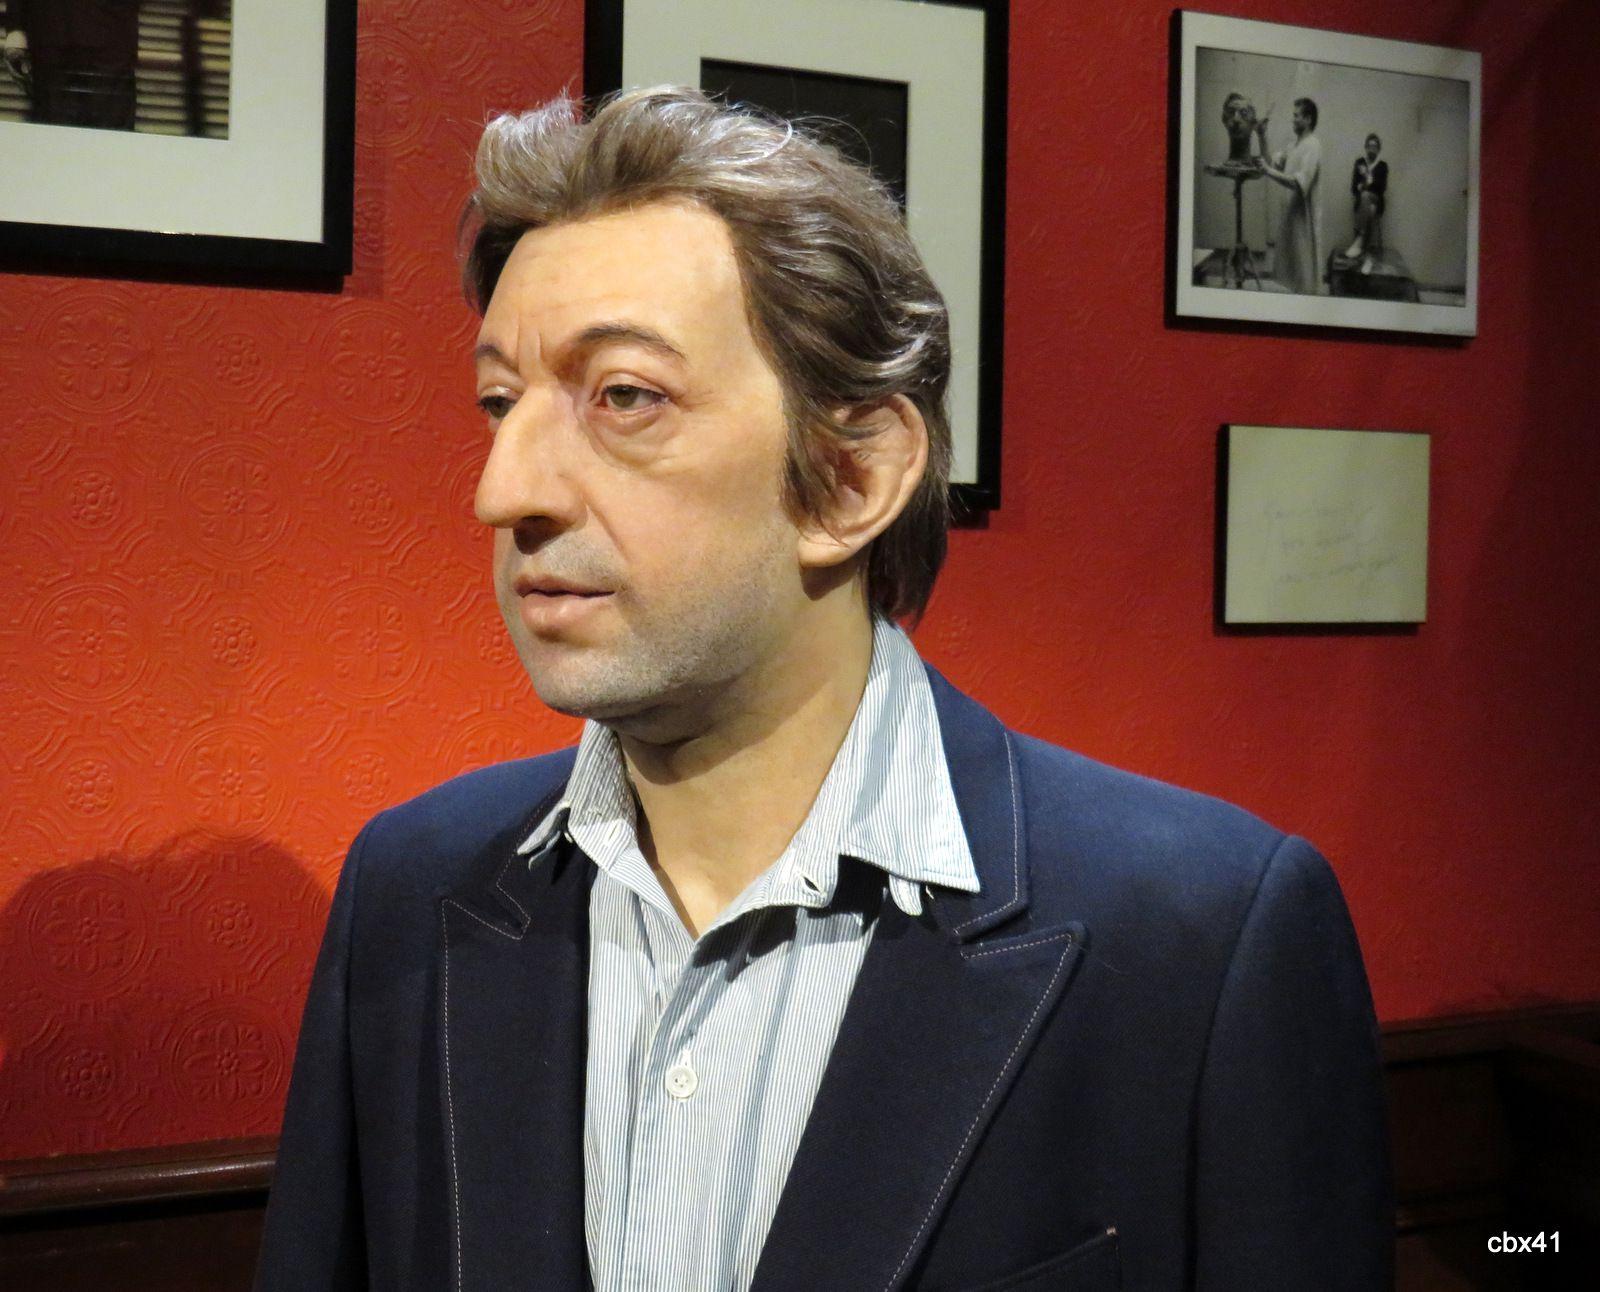 Serge Gainsbourg, musée Grévin